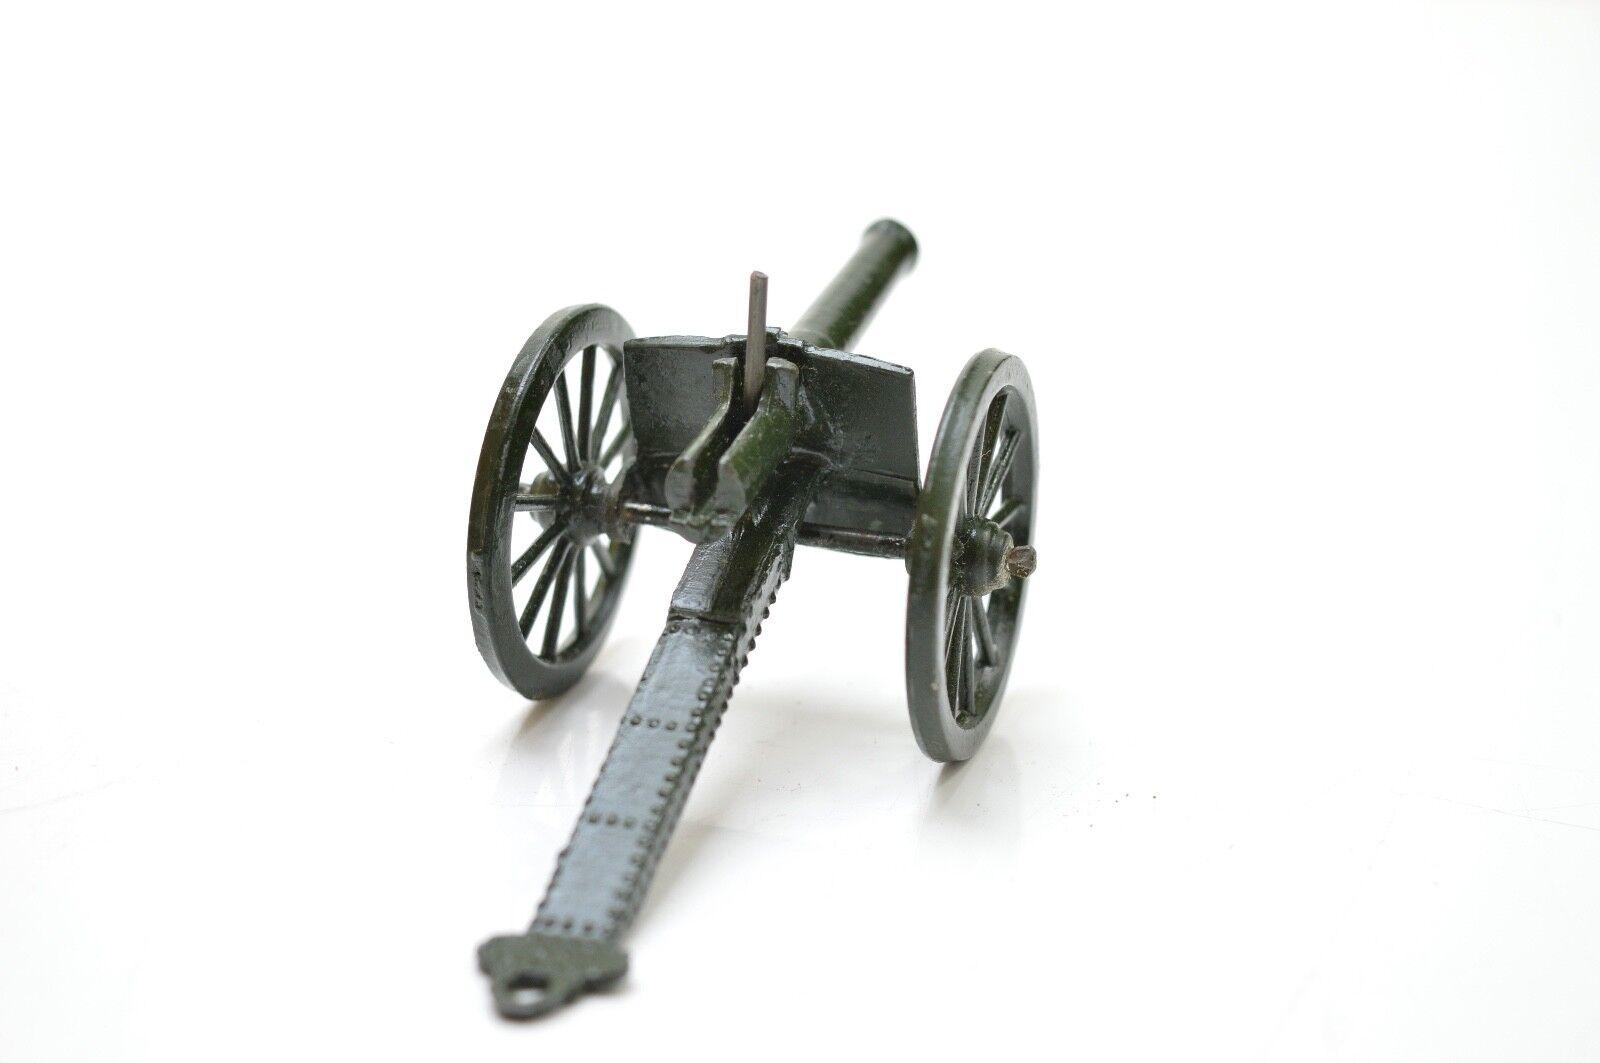 BRITAINS 1263 1263 1263 ROYAL ARTILLERY GUN 0da95f